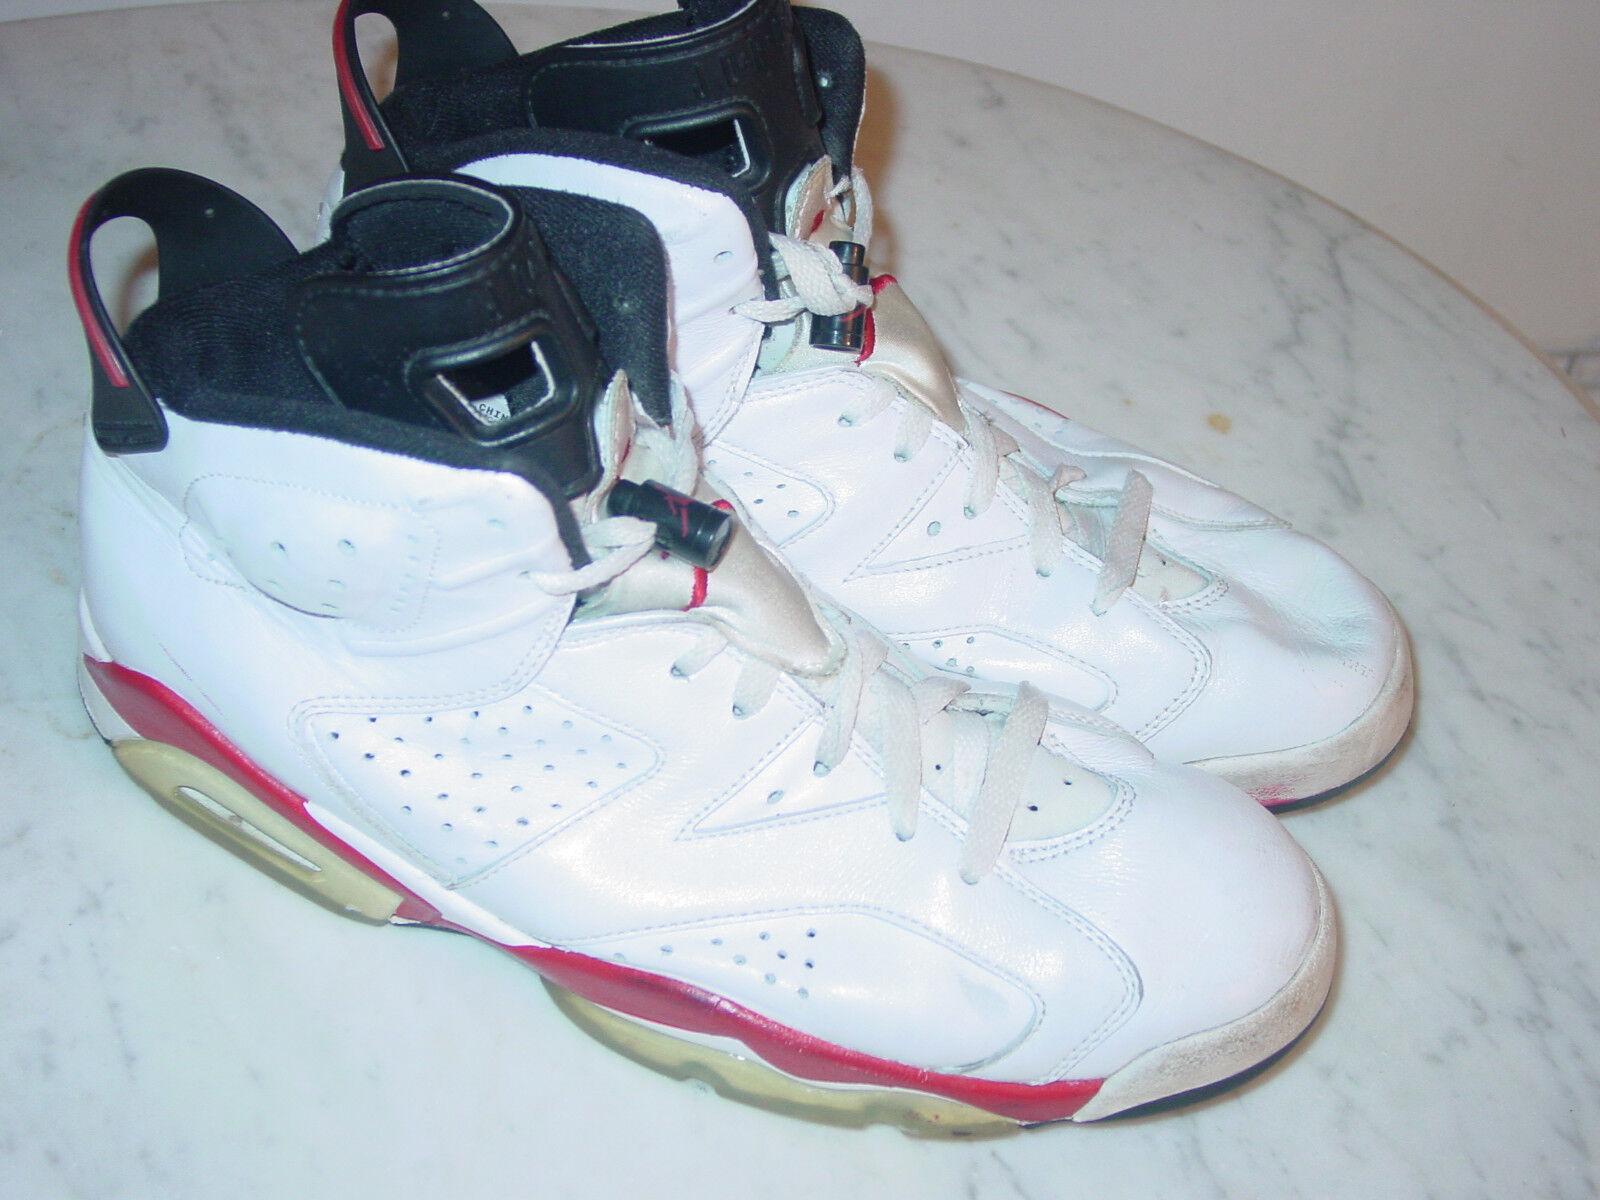 2009 Nike Air Air Air Jordan Retro 6  Bulls  White Varsity Red shoes Size 11 Sold As Is  b76b7d